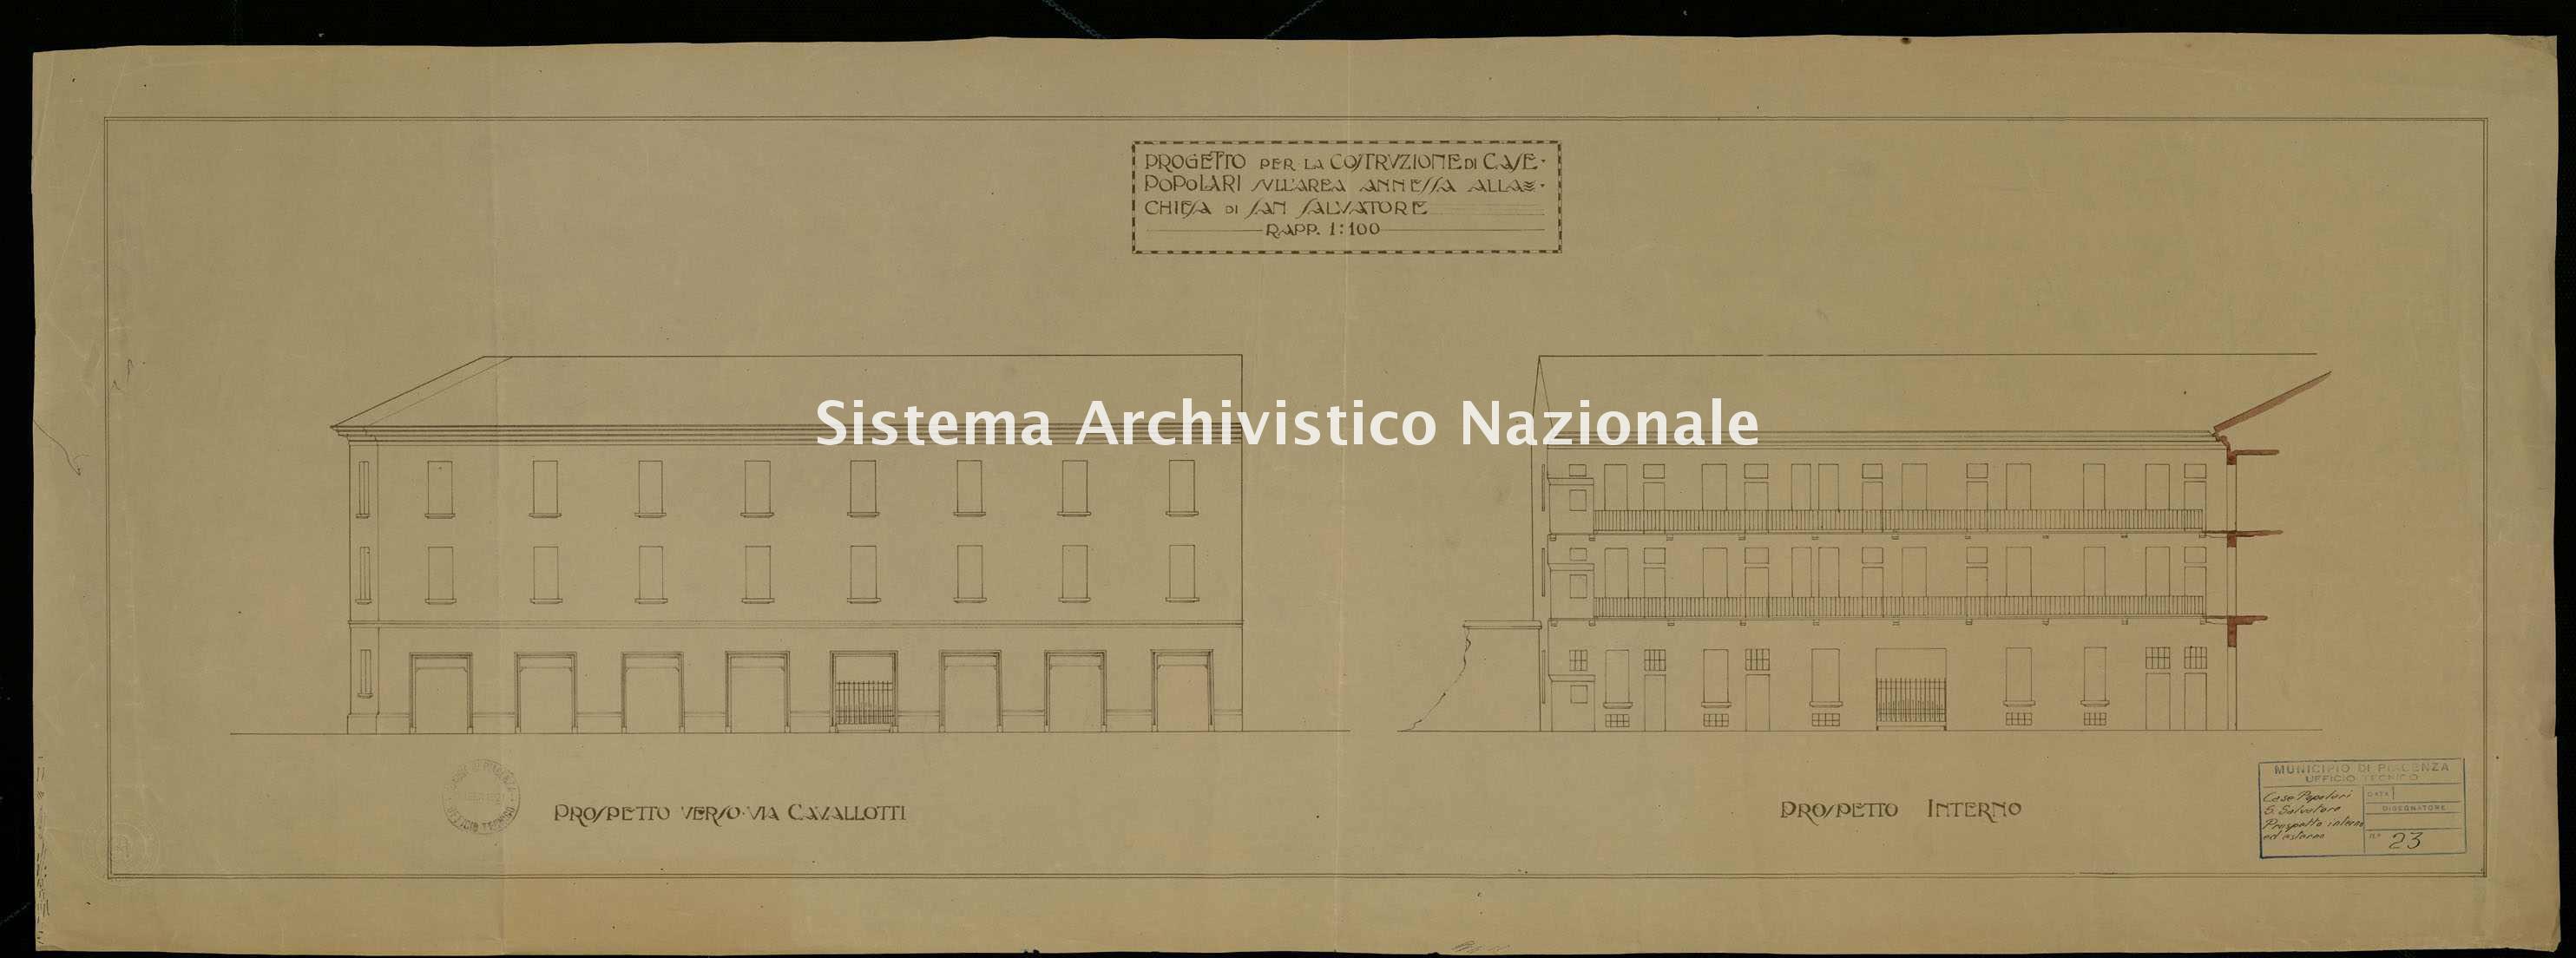 ASPC Mappe, stampe e disegni, n. 5225